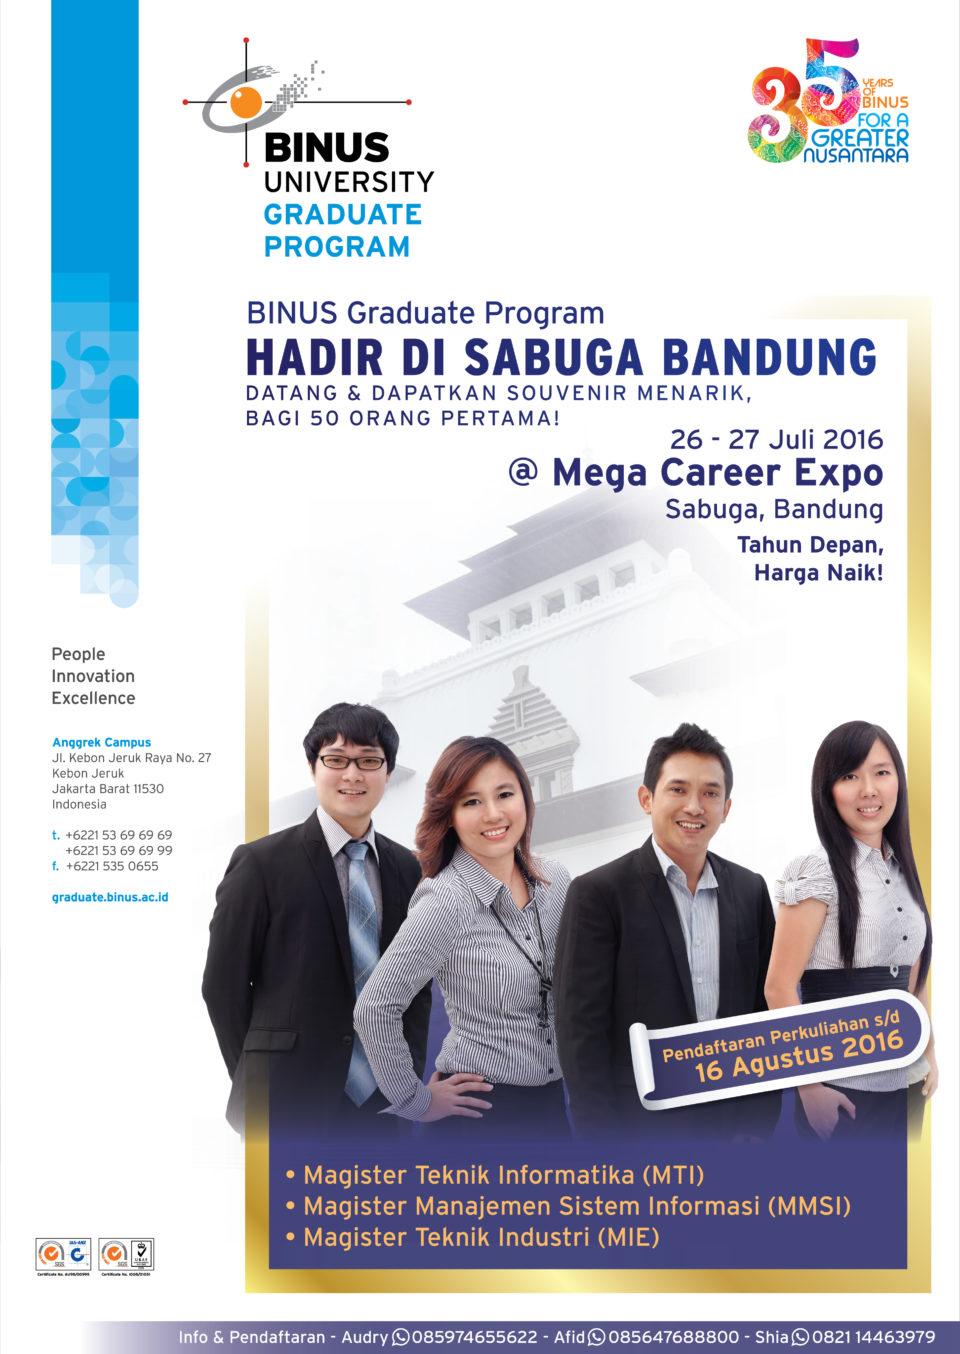 Graduate program jakarta